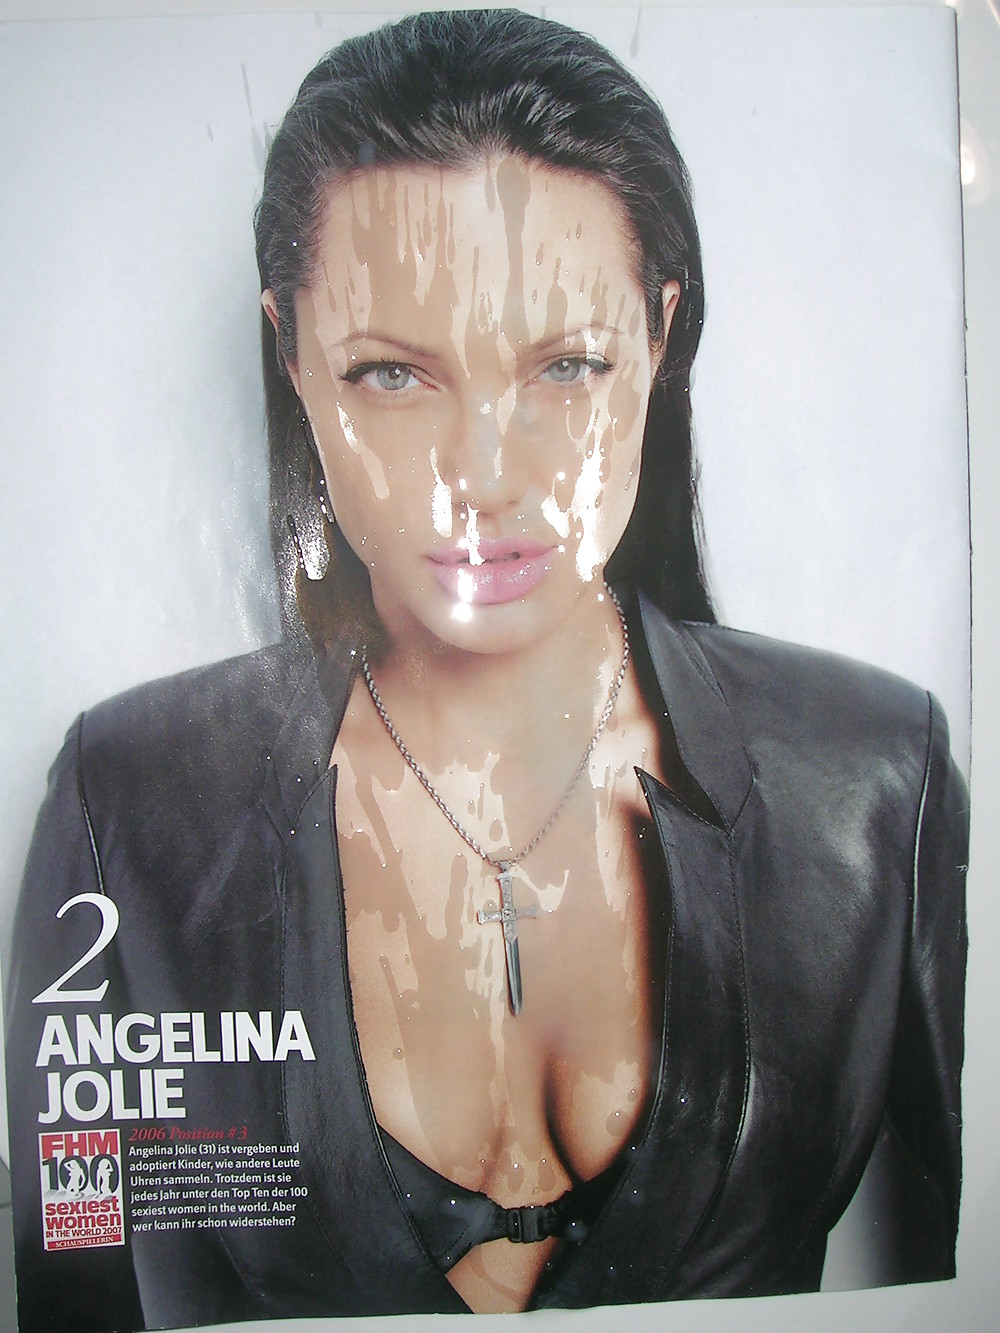 Angelina jolie fake cum diabetic cunts big